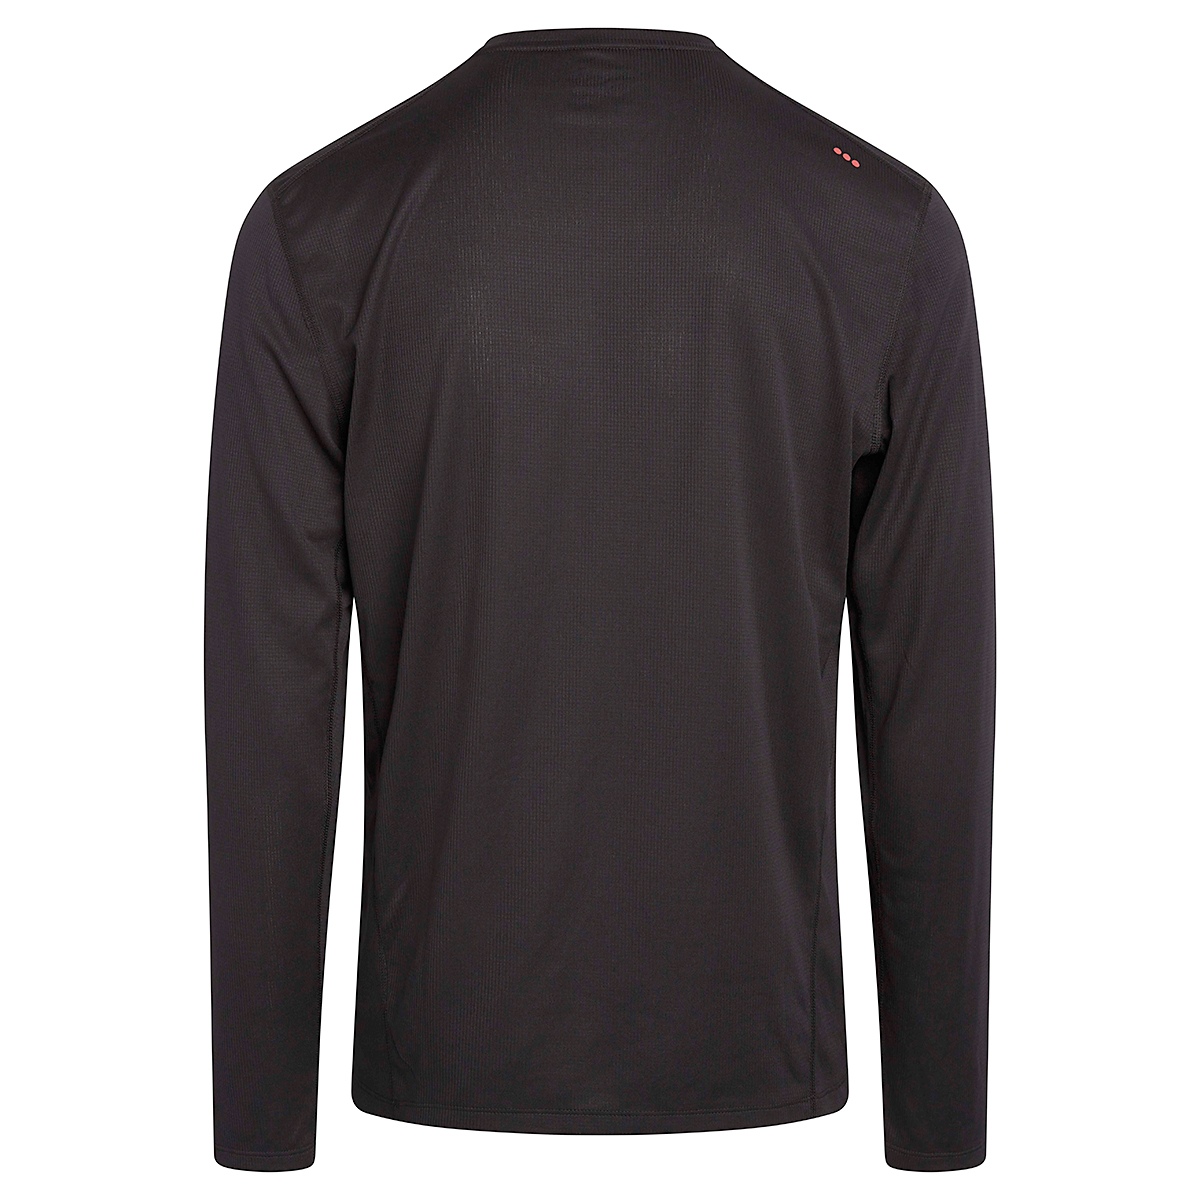 Men's Saucony Stopwatch Long Sleeve - Color: Black - Size: S, Black, large, image 4